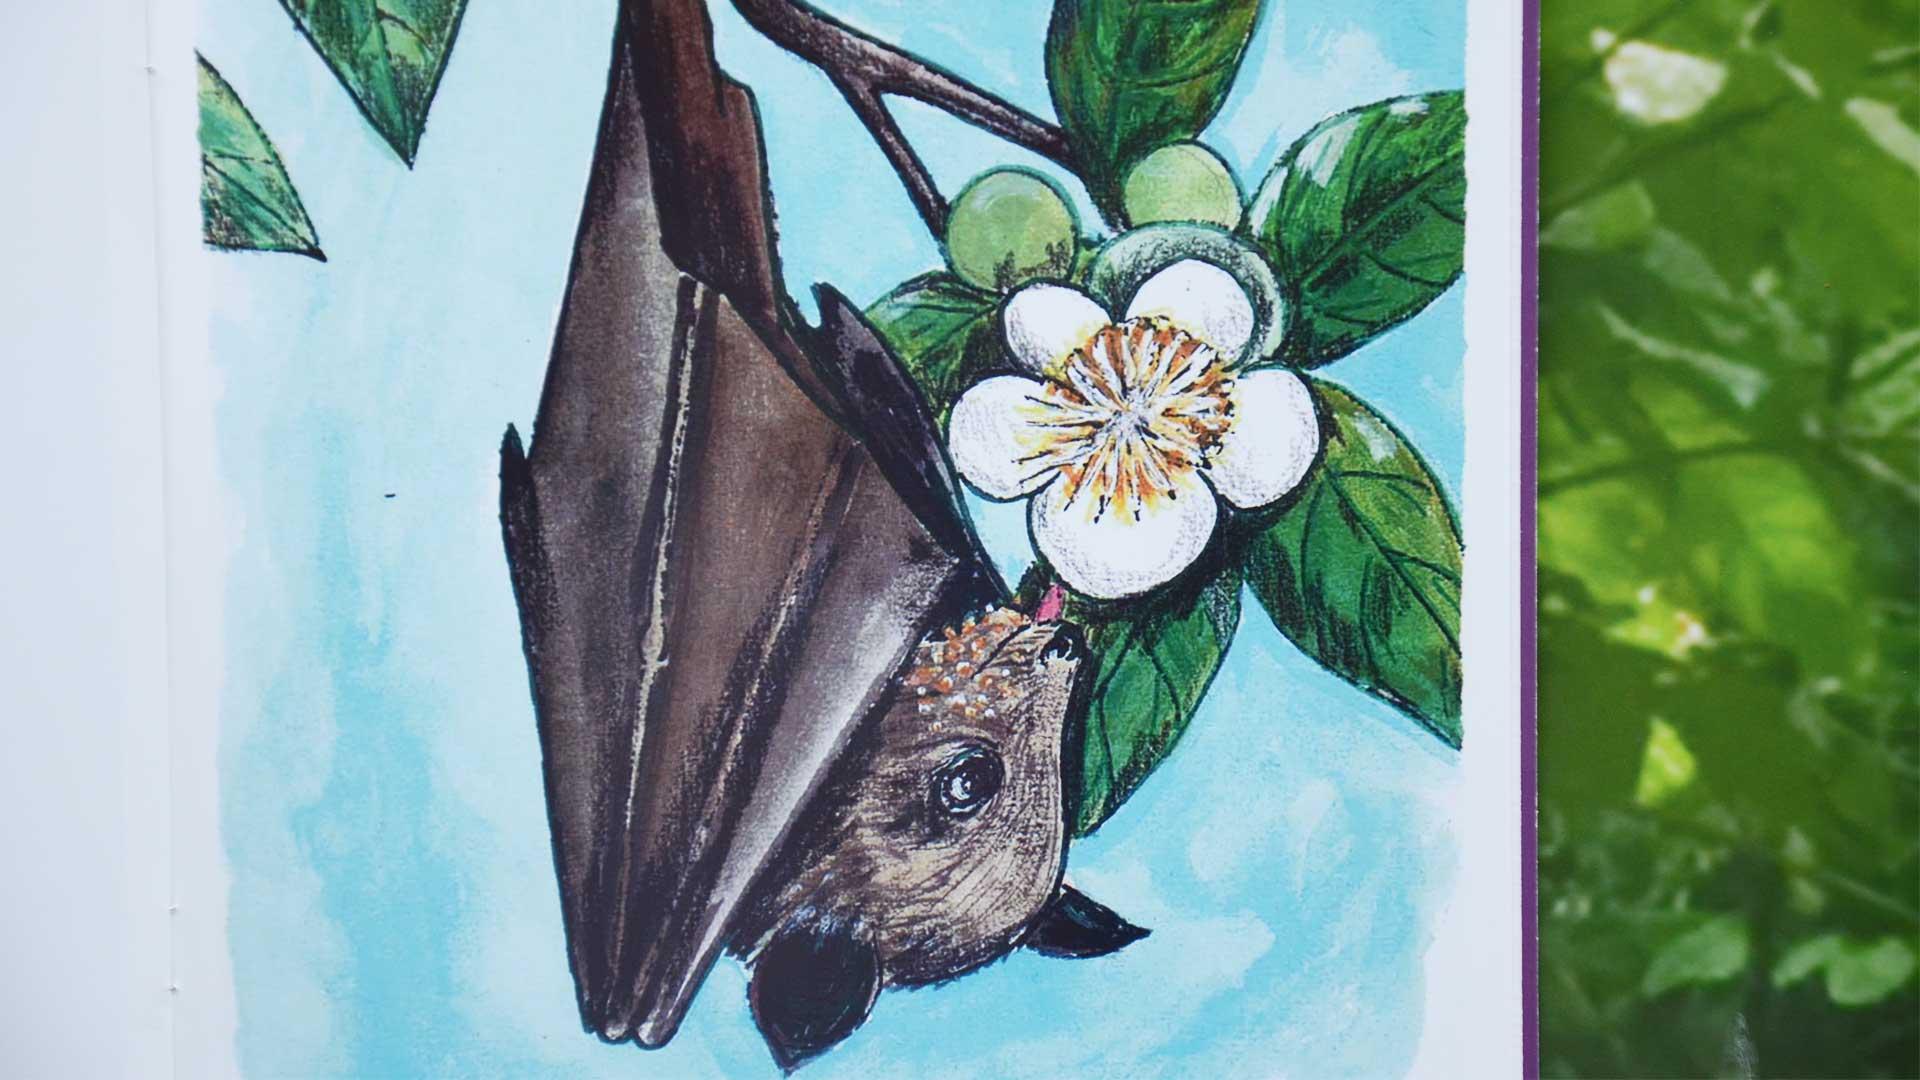 https://rfacdn.nz/zoo/assets/media/bat-book-fiji-gallery-6.jpg